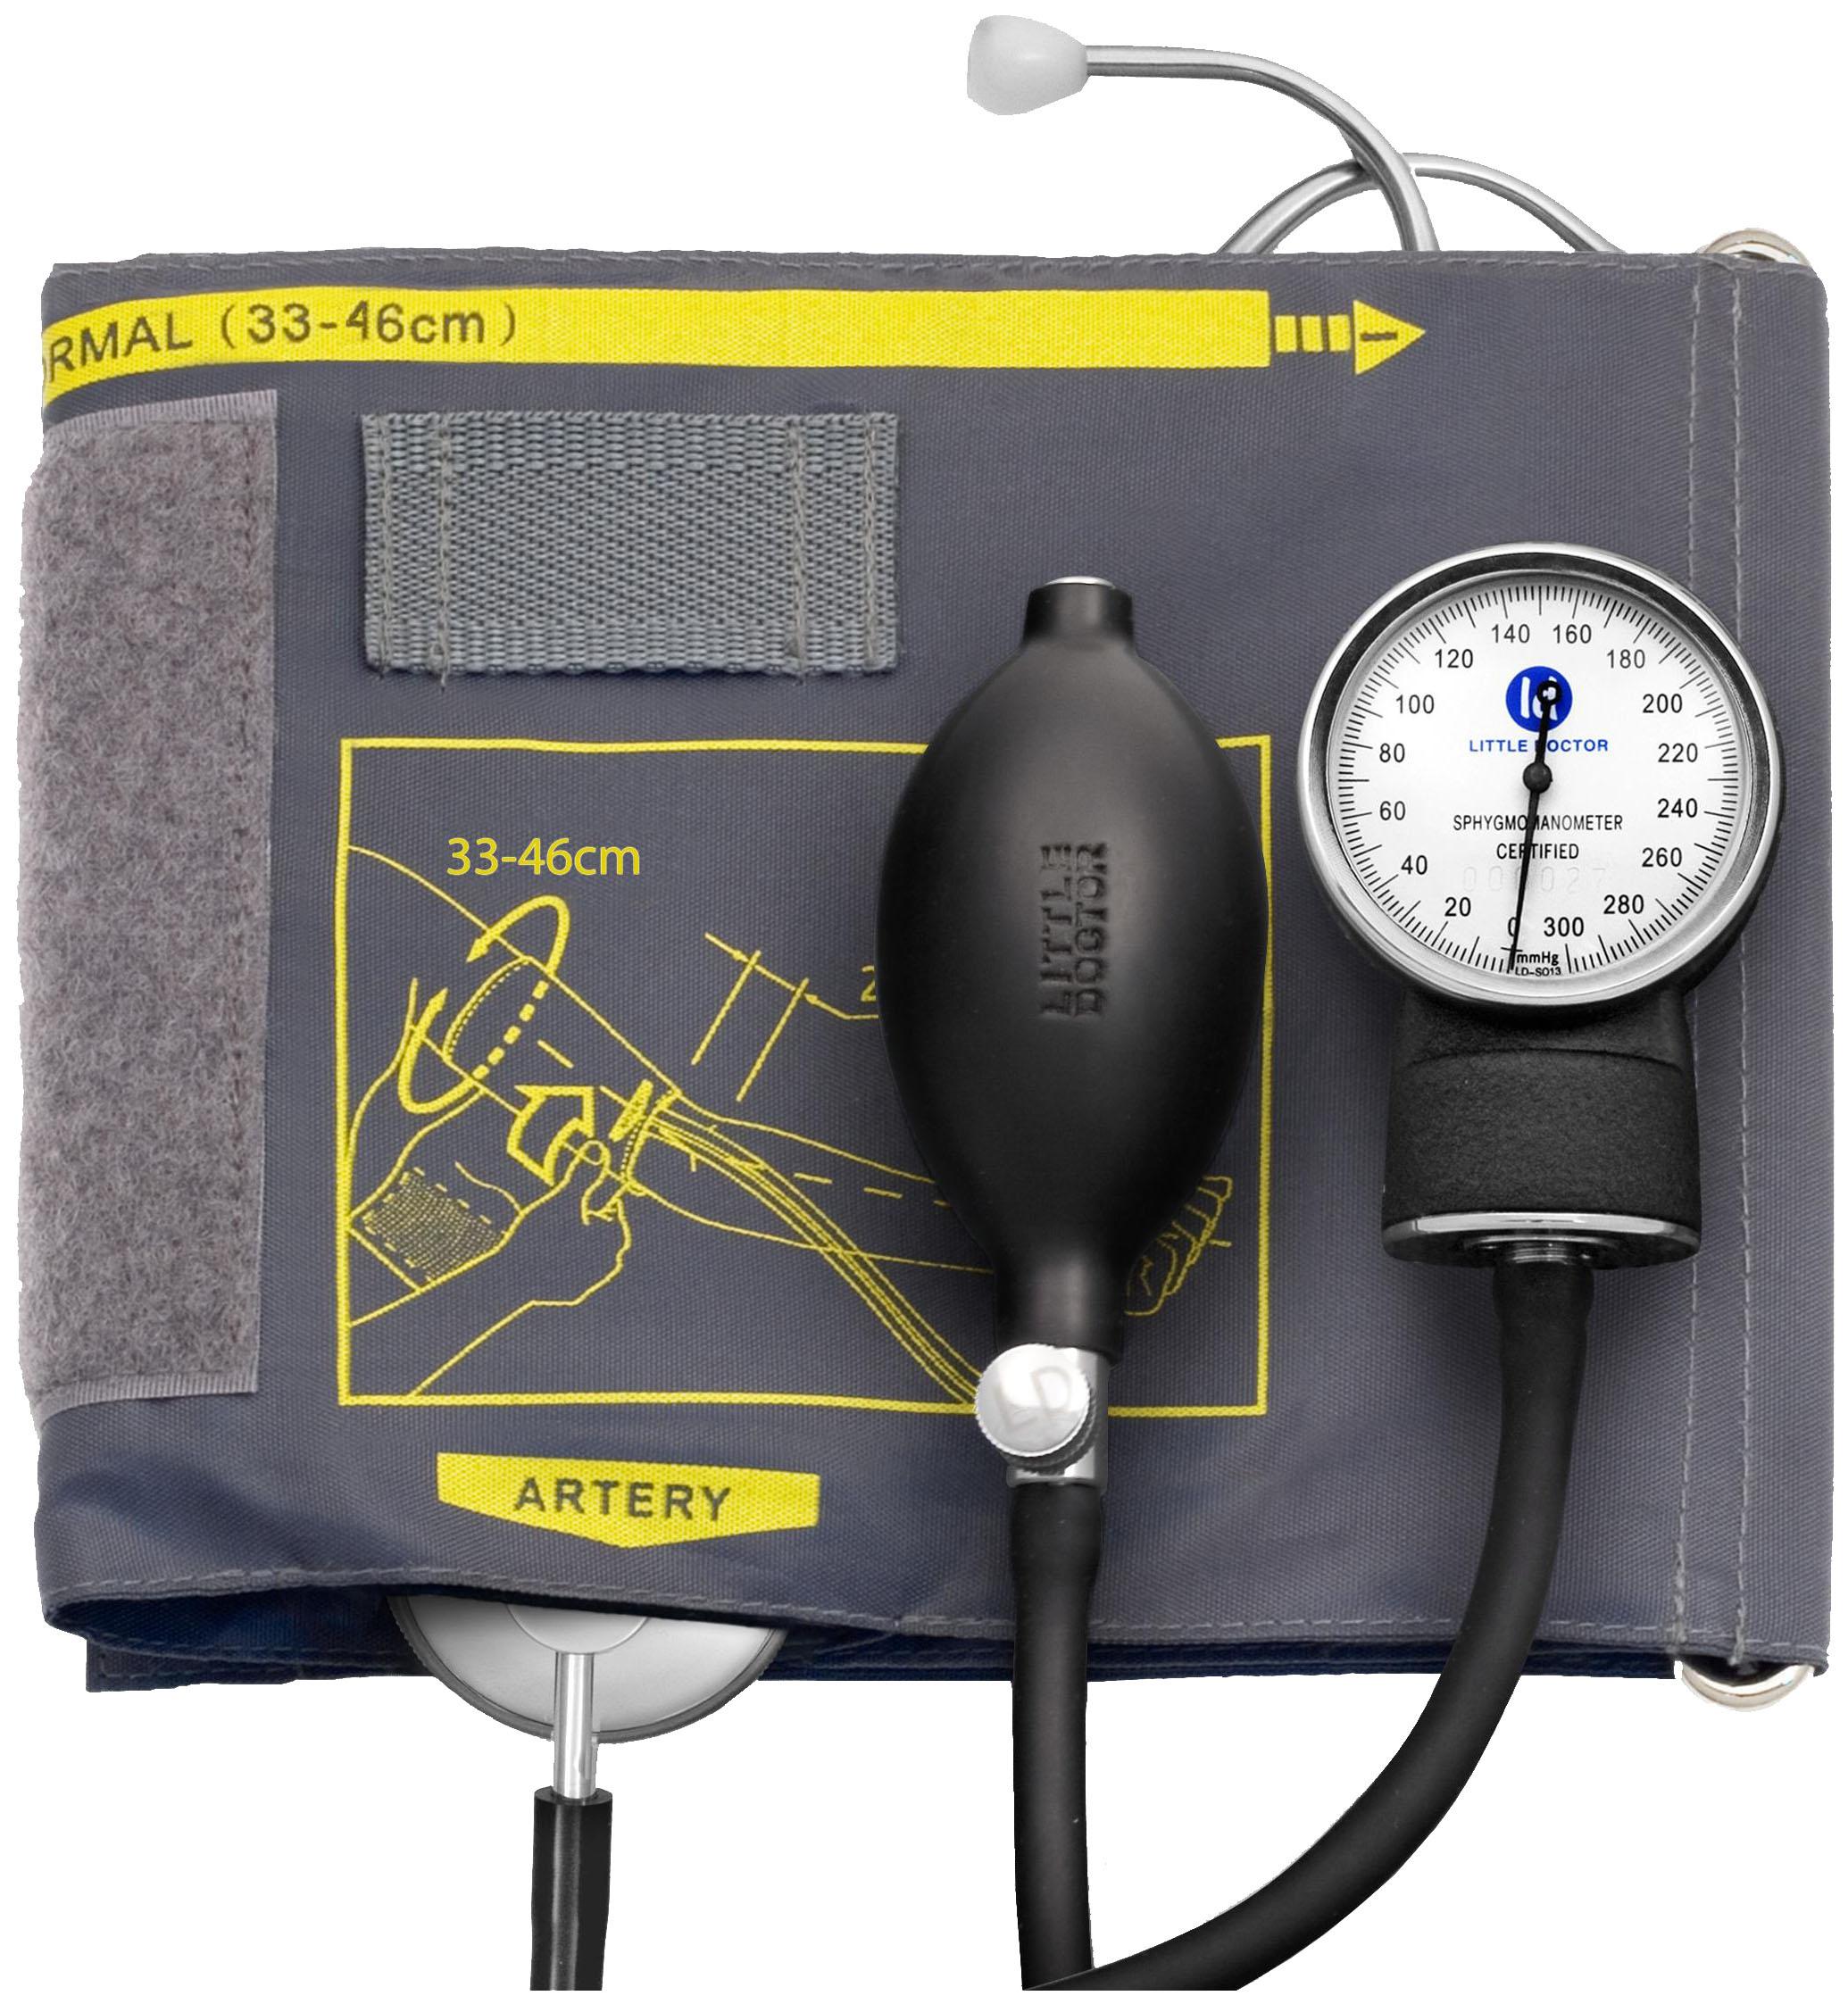 Тонометр Little Doctor LD-60 механический на плечо со стетоскопом манжета 33-46 см фото